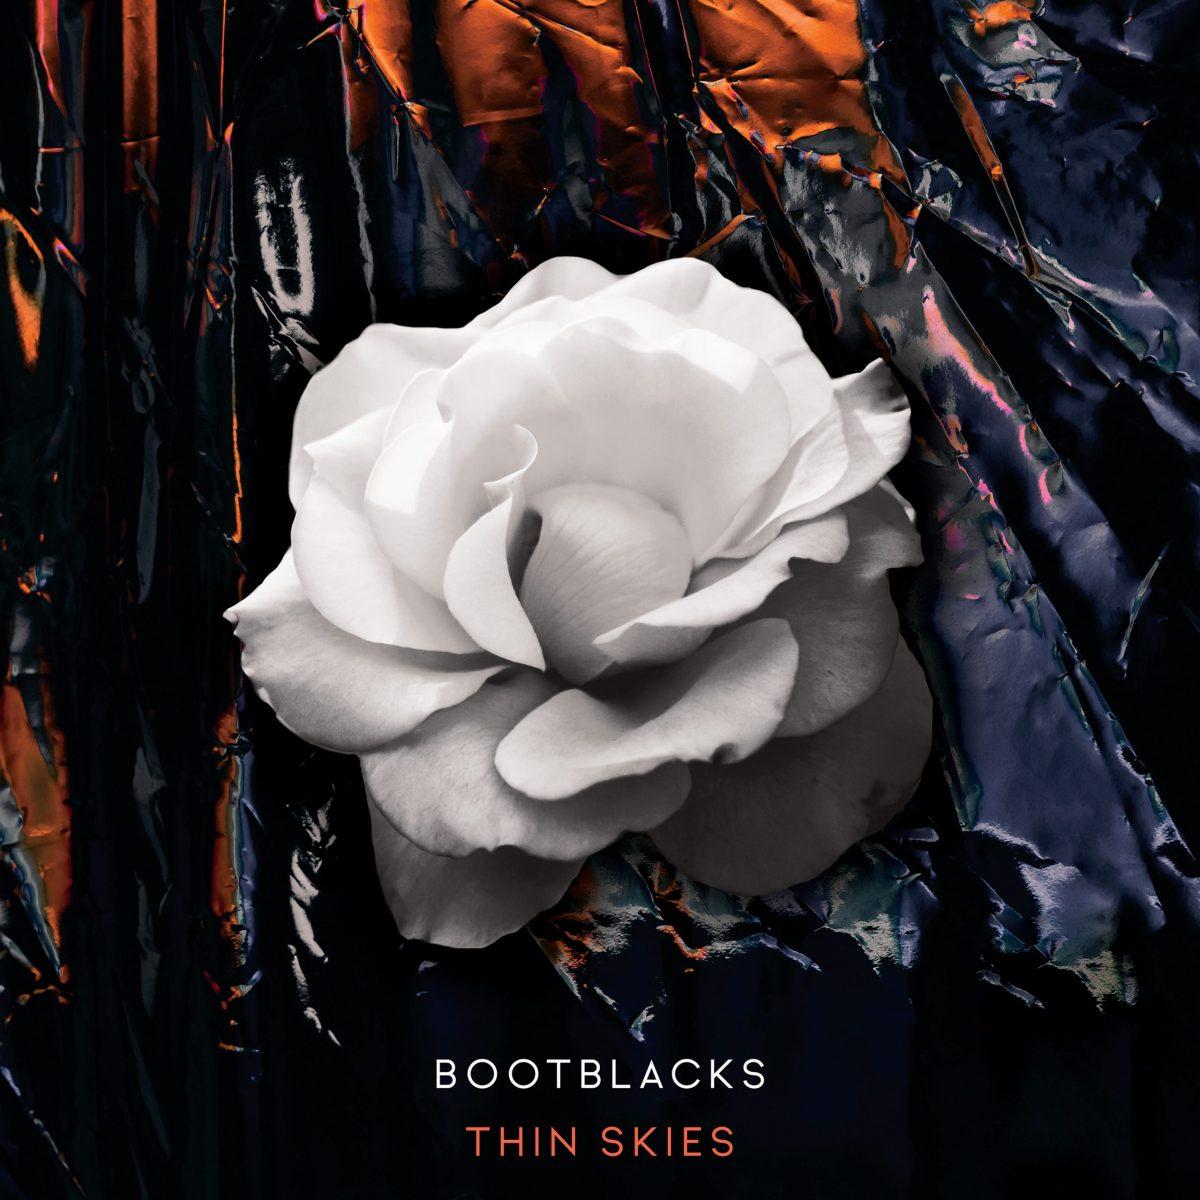 bootblacks-thin-skies-album-review